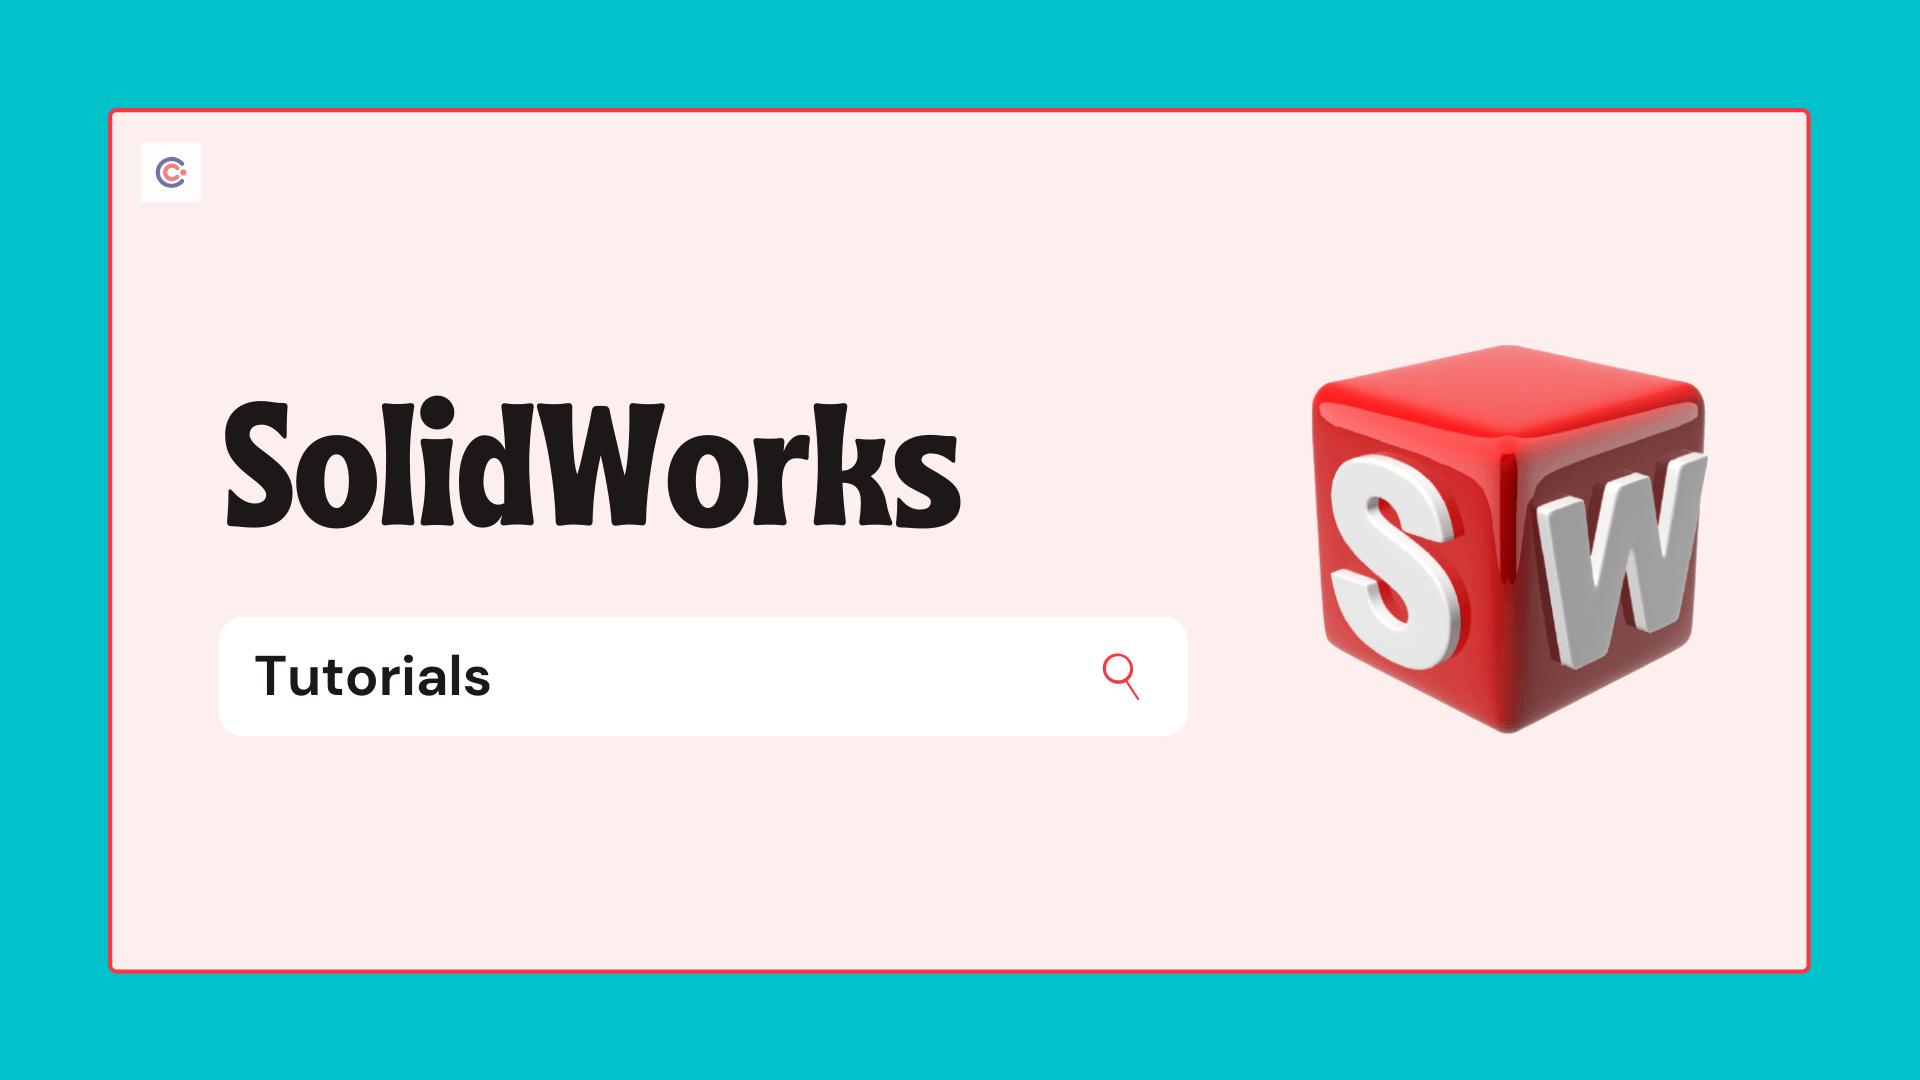 7 Best SolidWorks Tutorials - Learn SolidWorks Online